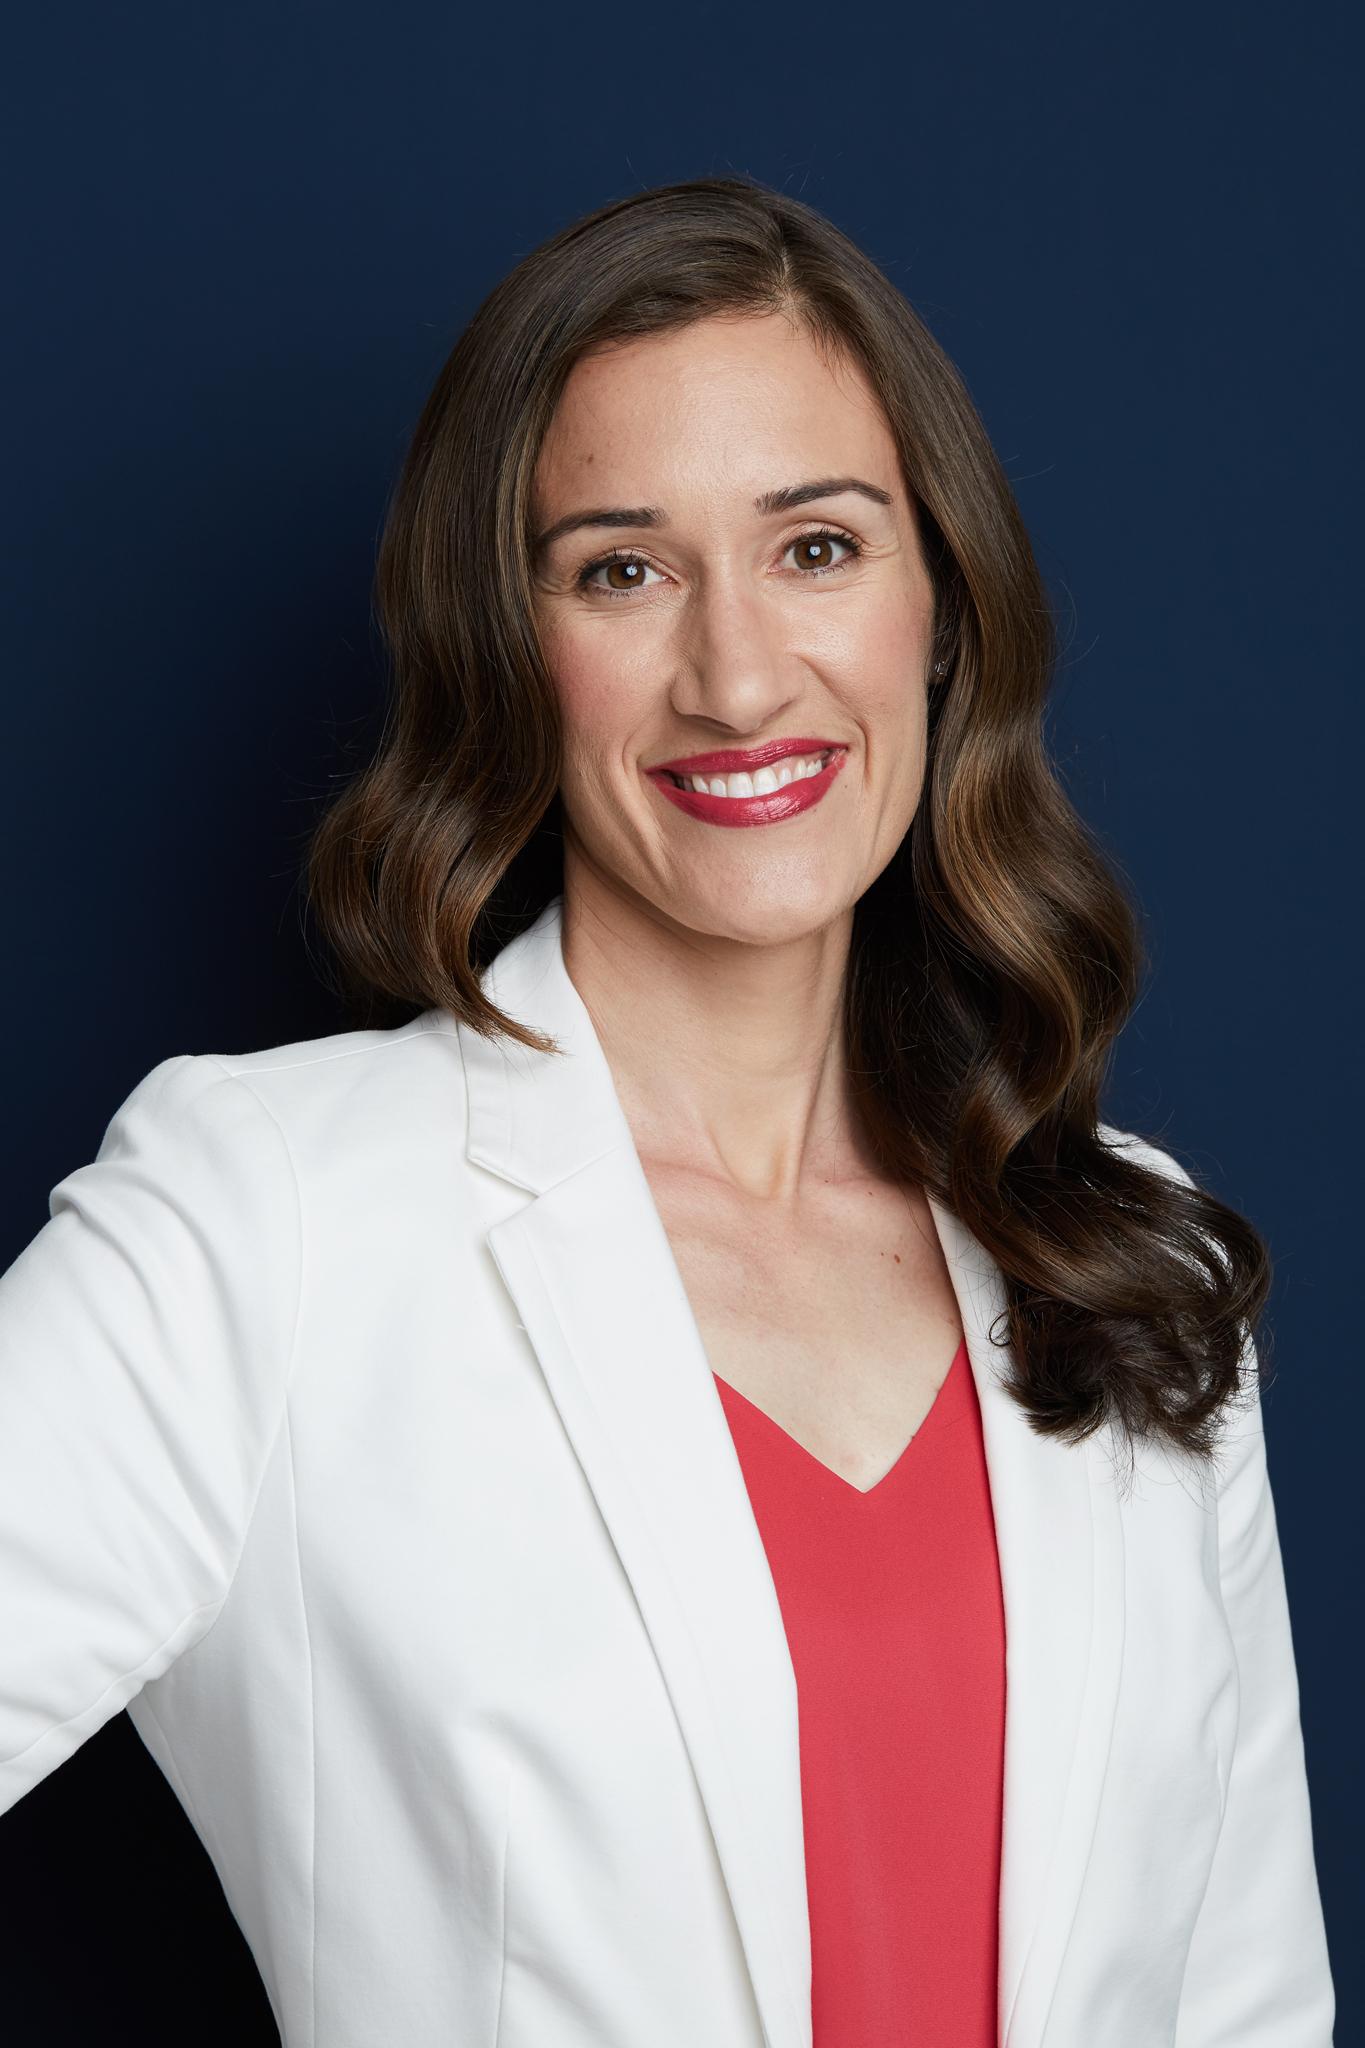 Aenslee Tanner, Founder of Personal Brand Agency